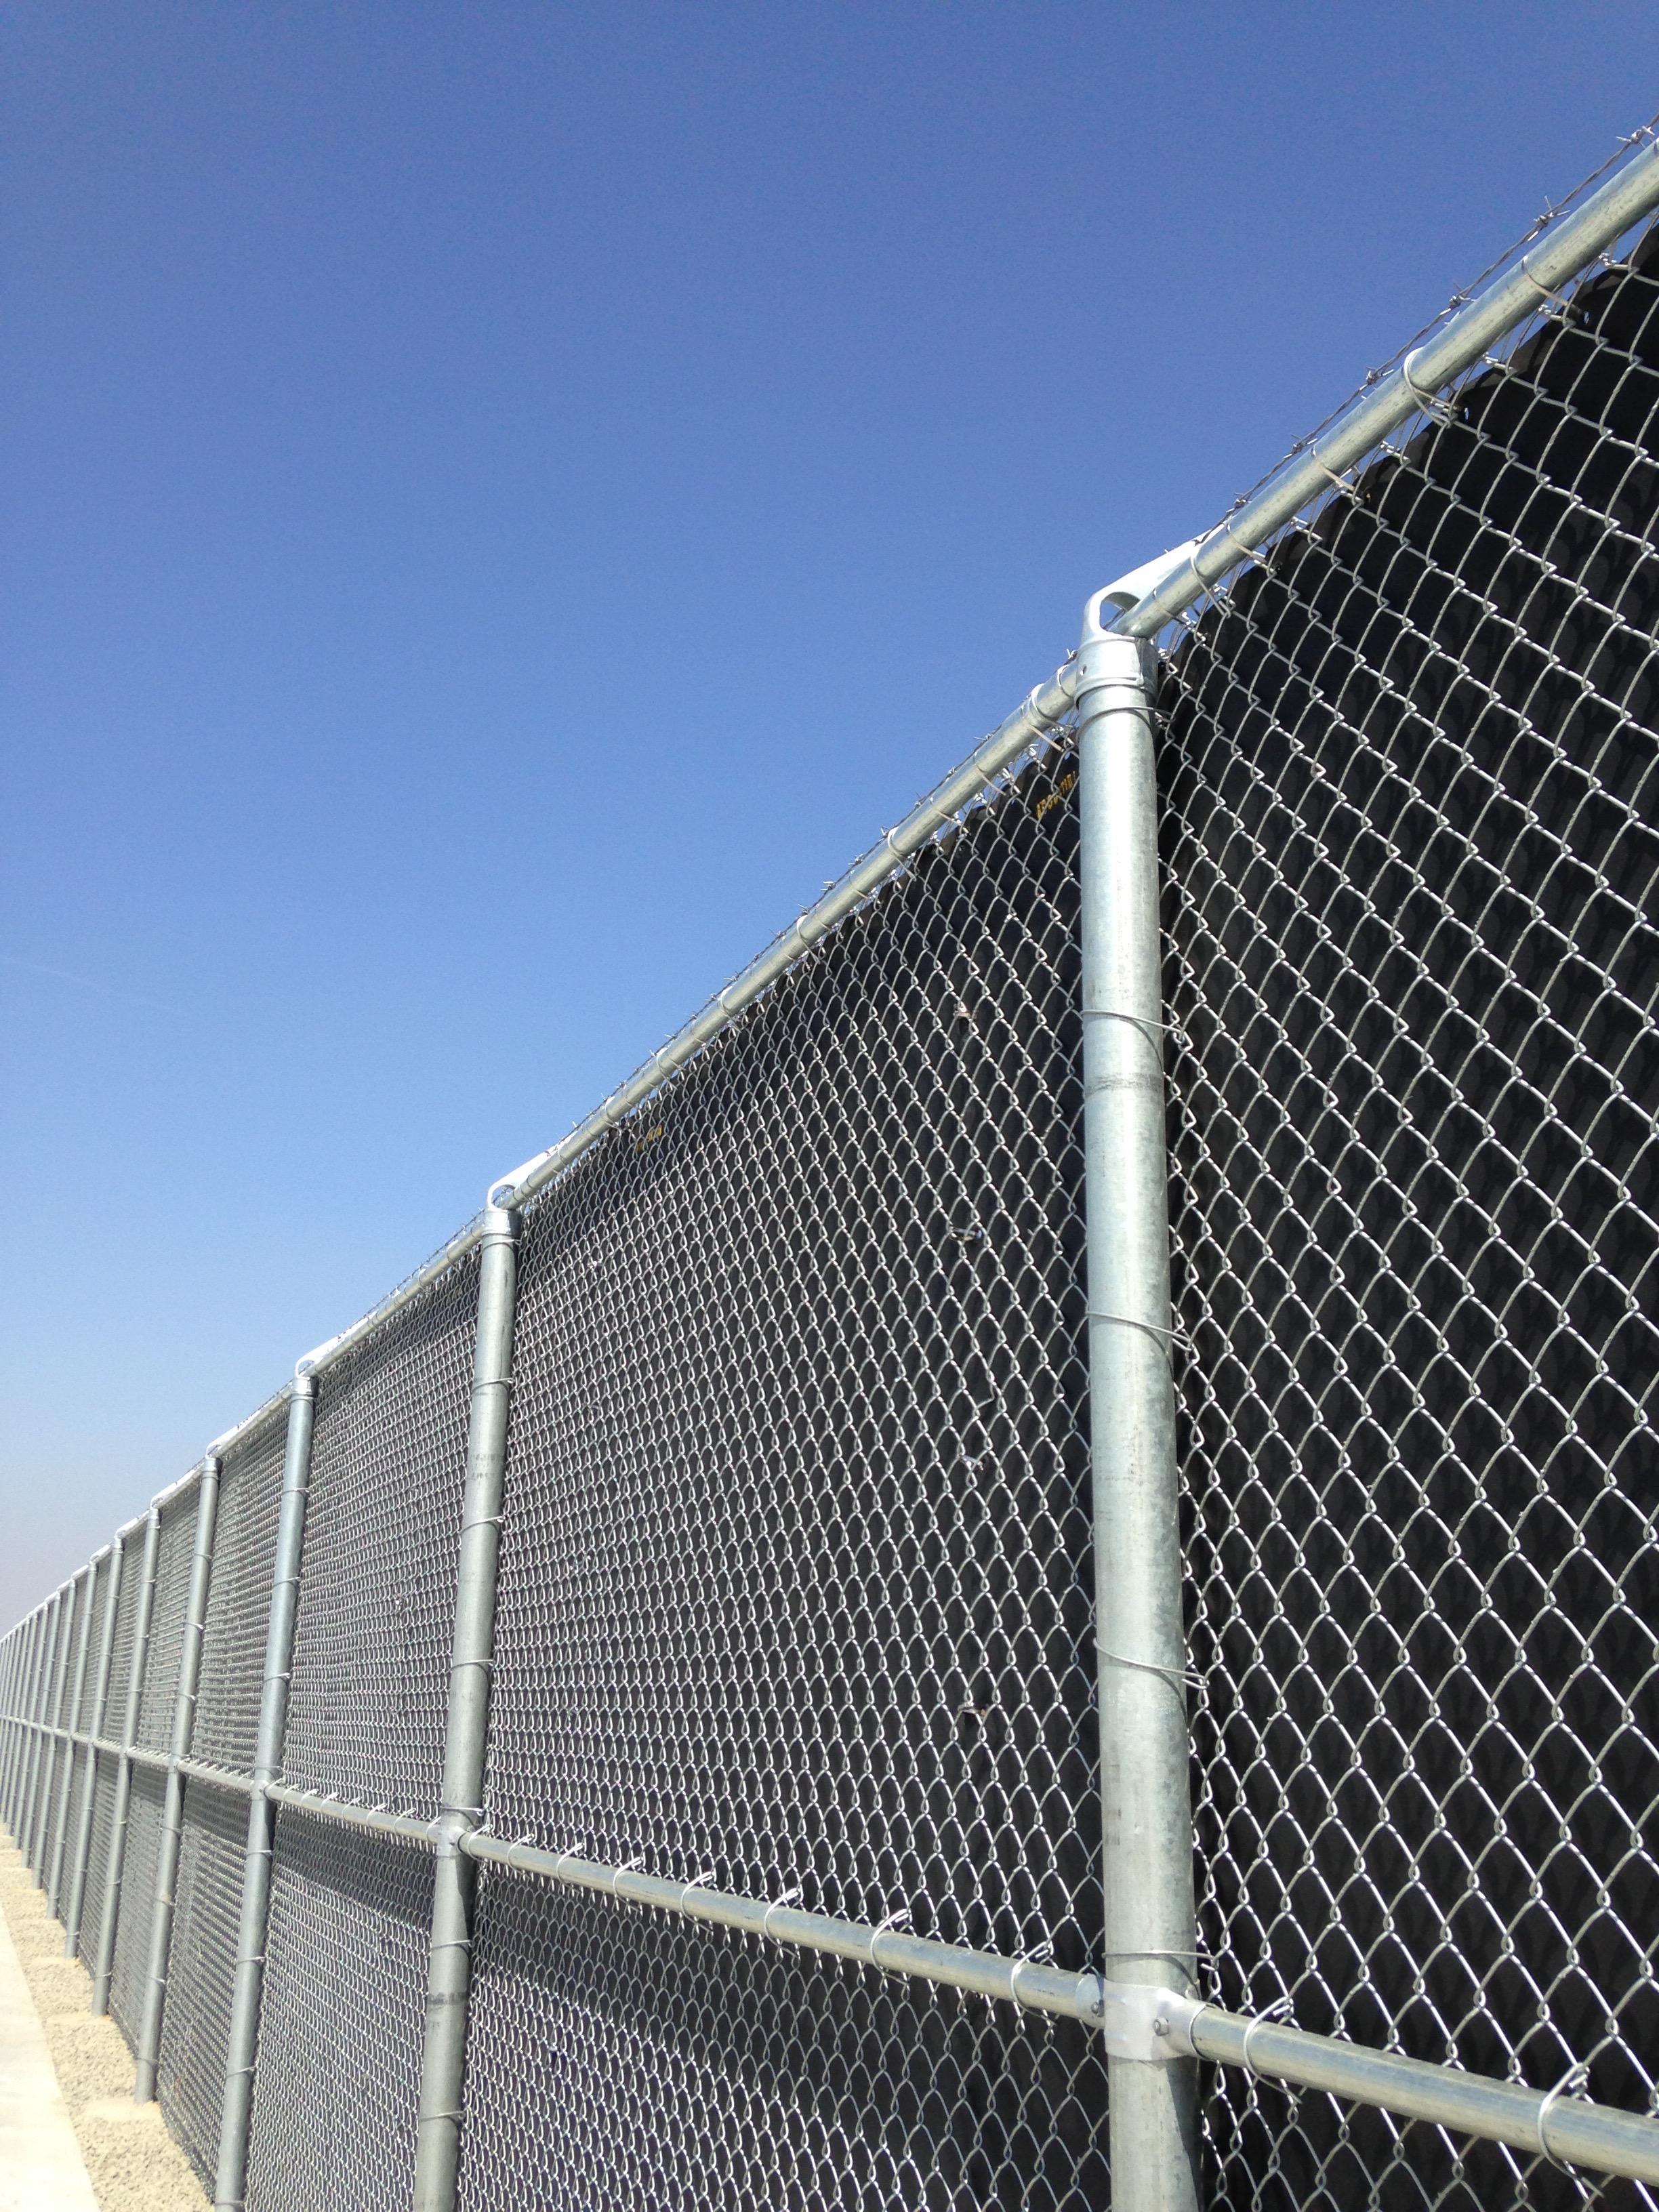 Acoustiblok 174 Lands Solution To Noise At San Bernardino Airport